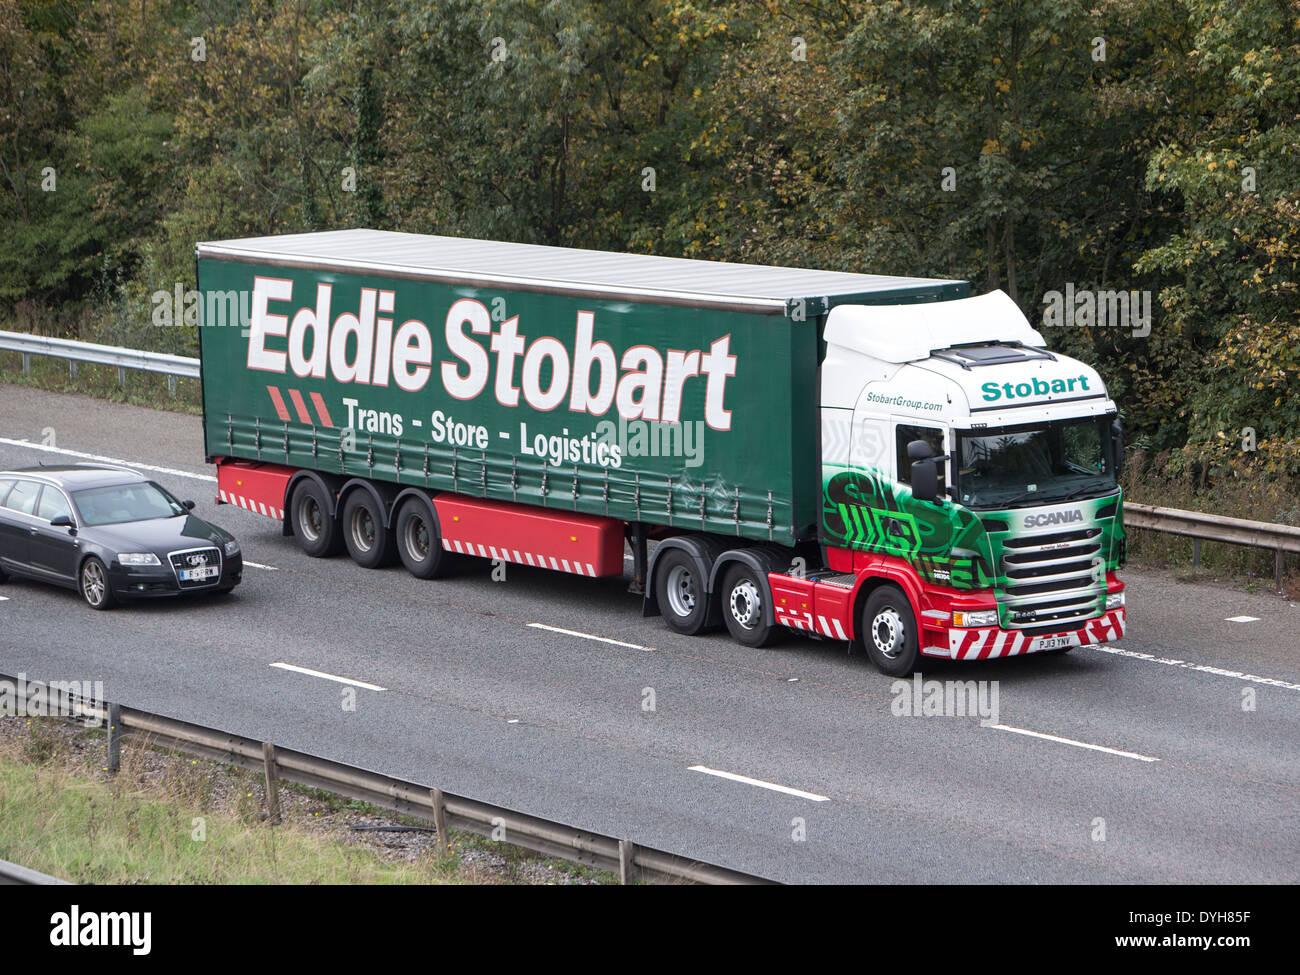 Eddie Stobart lorry on the M25 motorway delivering cargo - Stock Image